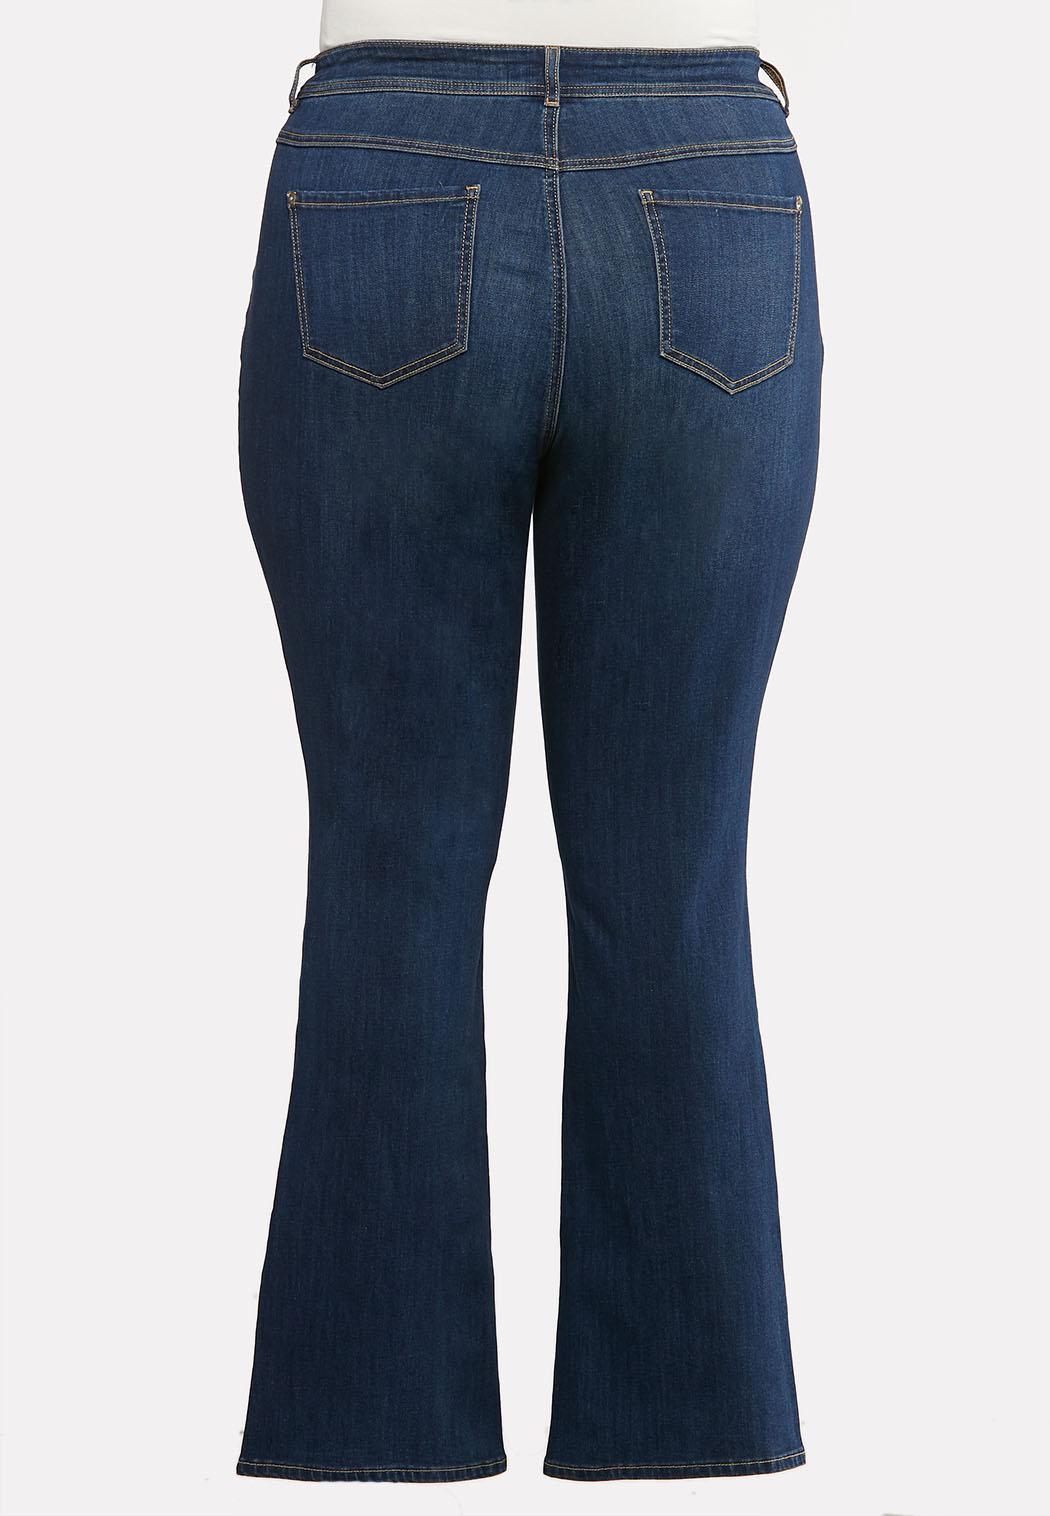 Plus Petite Dark Bootcut Jeans (Item #44132728)